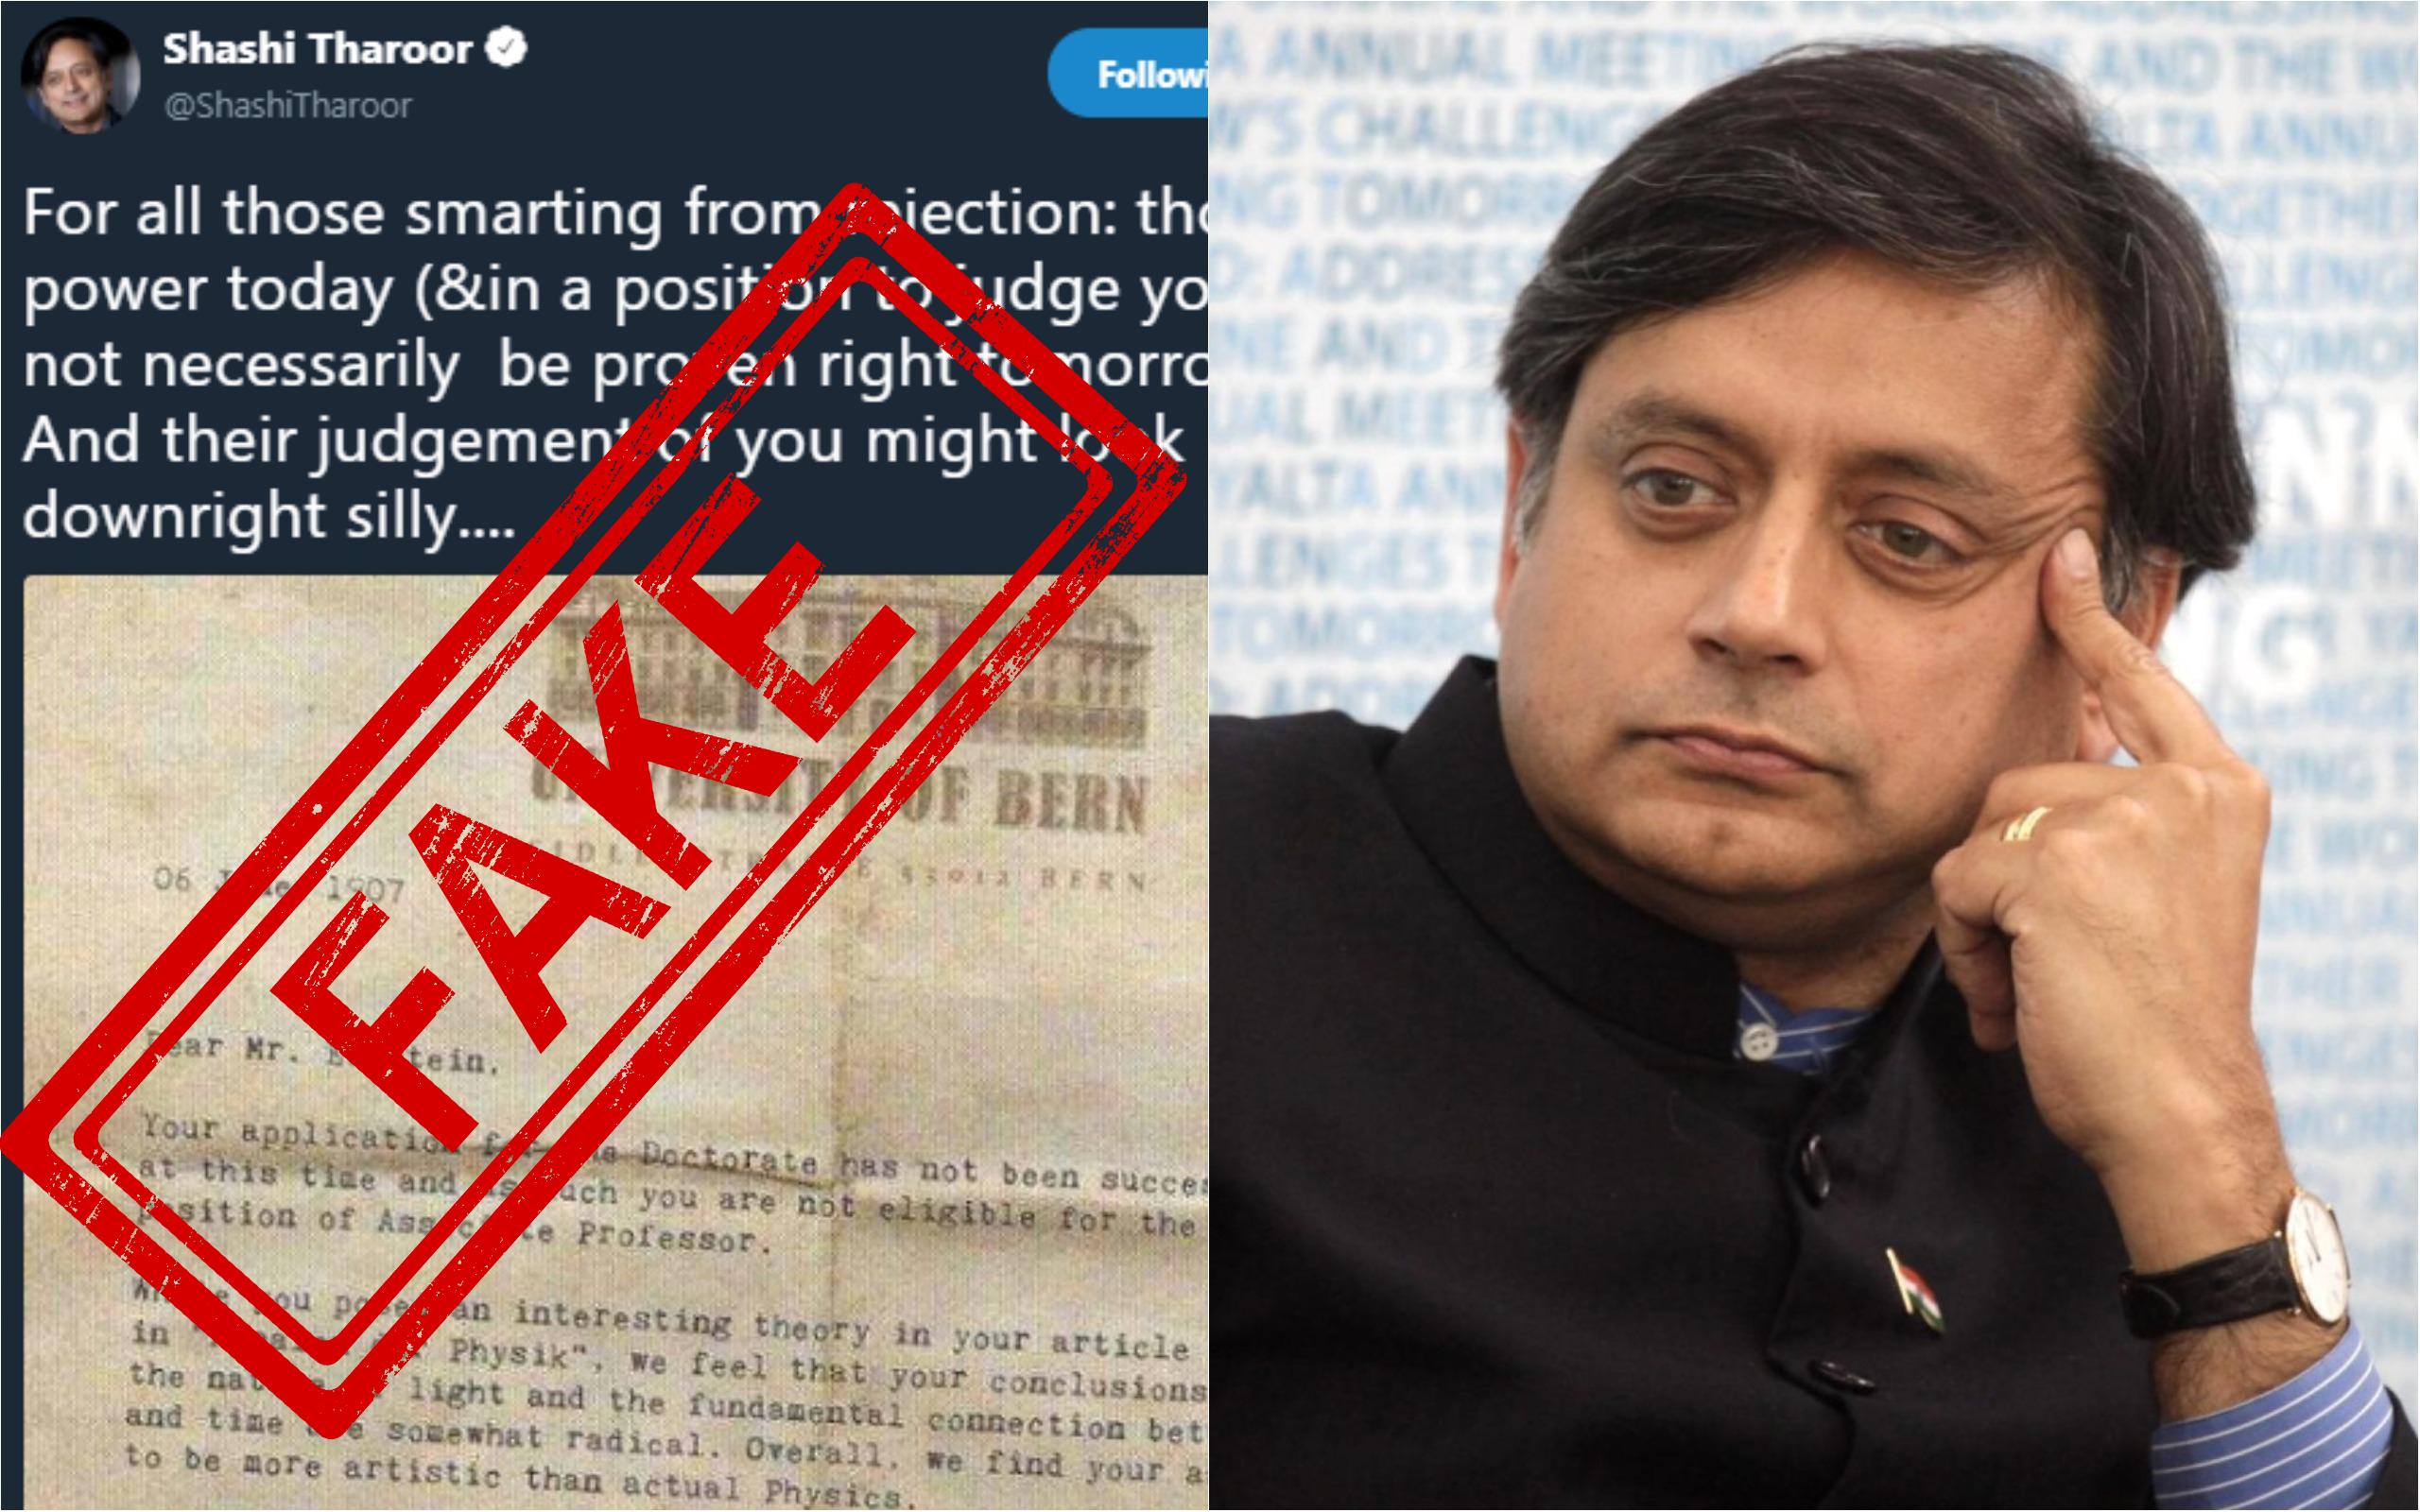 Shashi Tharoor, tweet, Albert Einstein, FAKE, letter, doctoral application, NewsMobile, Mobile News, India, Fake news, Twitter, Congress